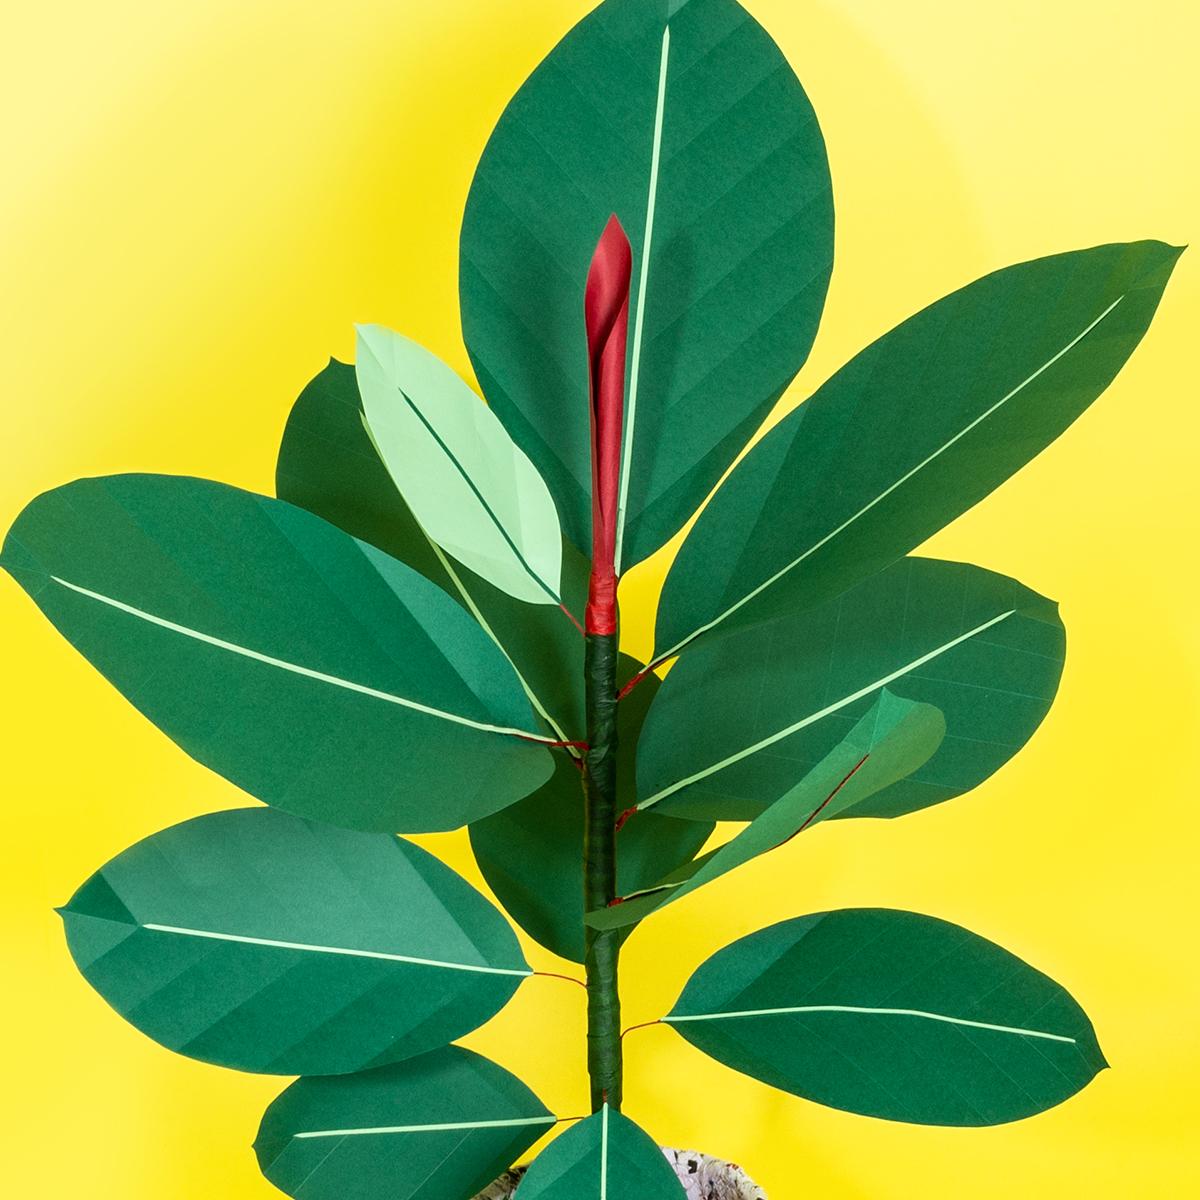 jungla, plantas de papel. ficus 1